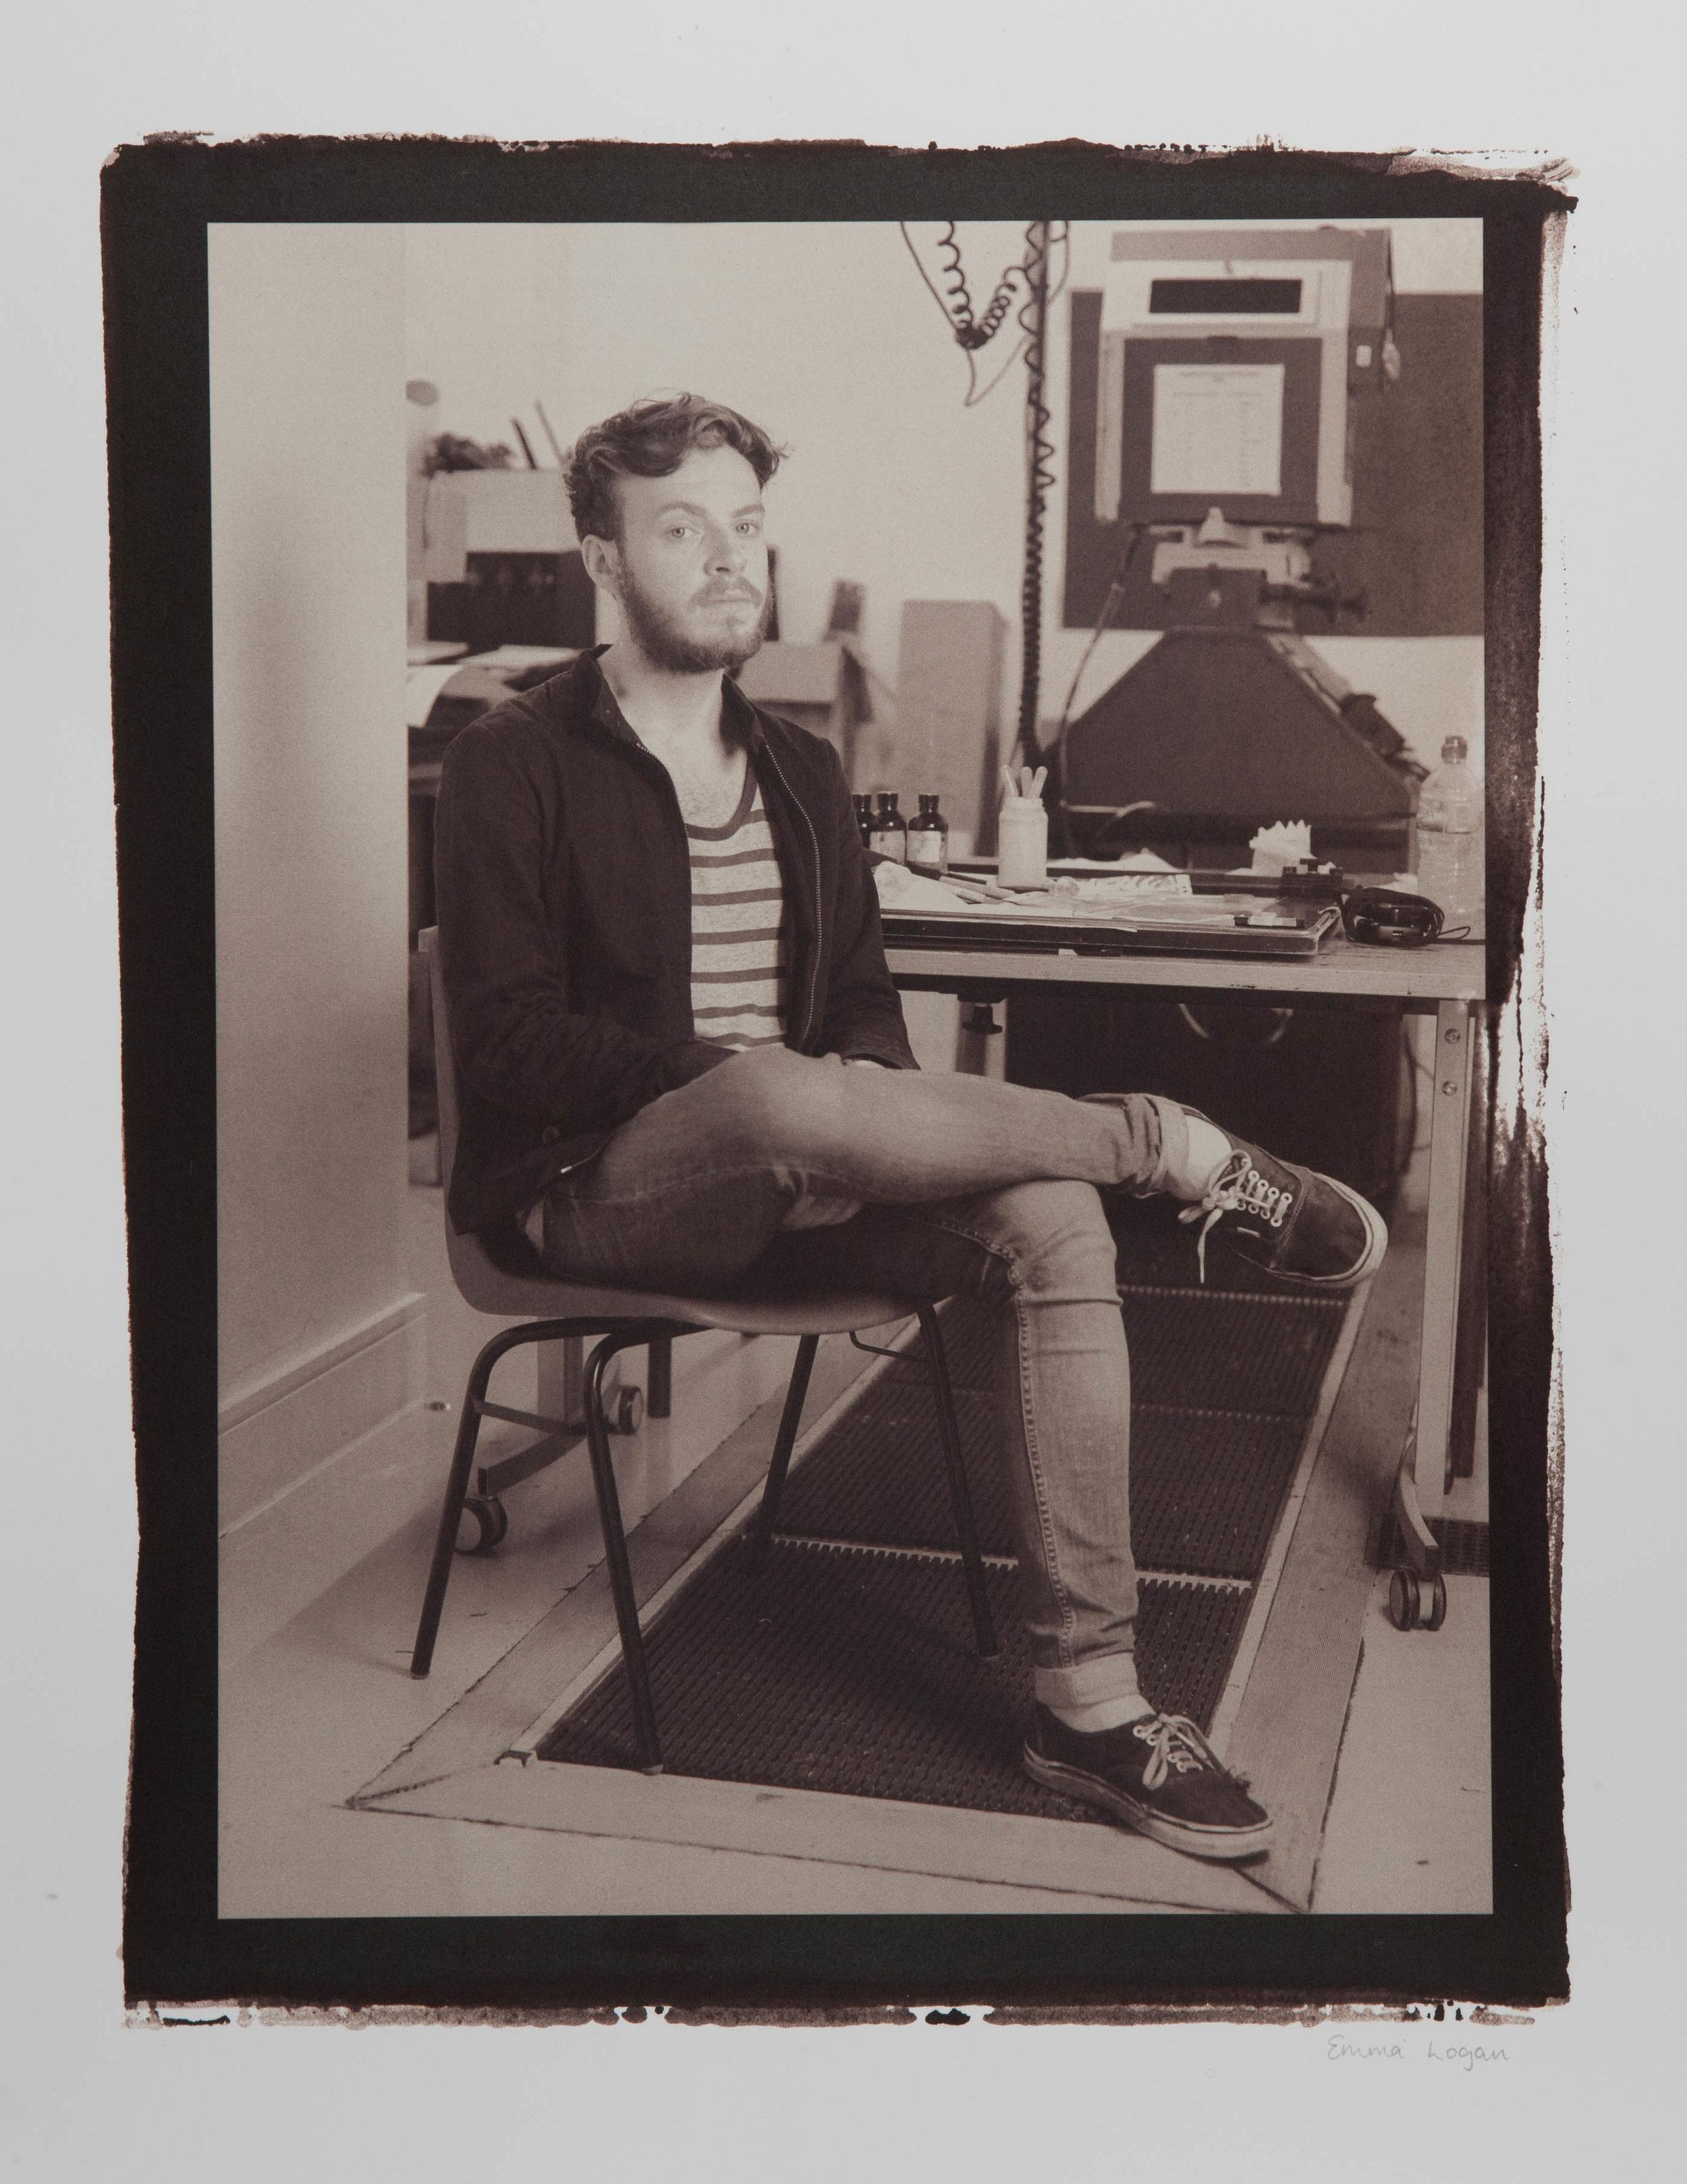 "Hand Made Crafts People. Alternative Photographic Processes.Digital Negative Salt Prints. Original size - 16x20""."